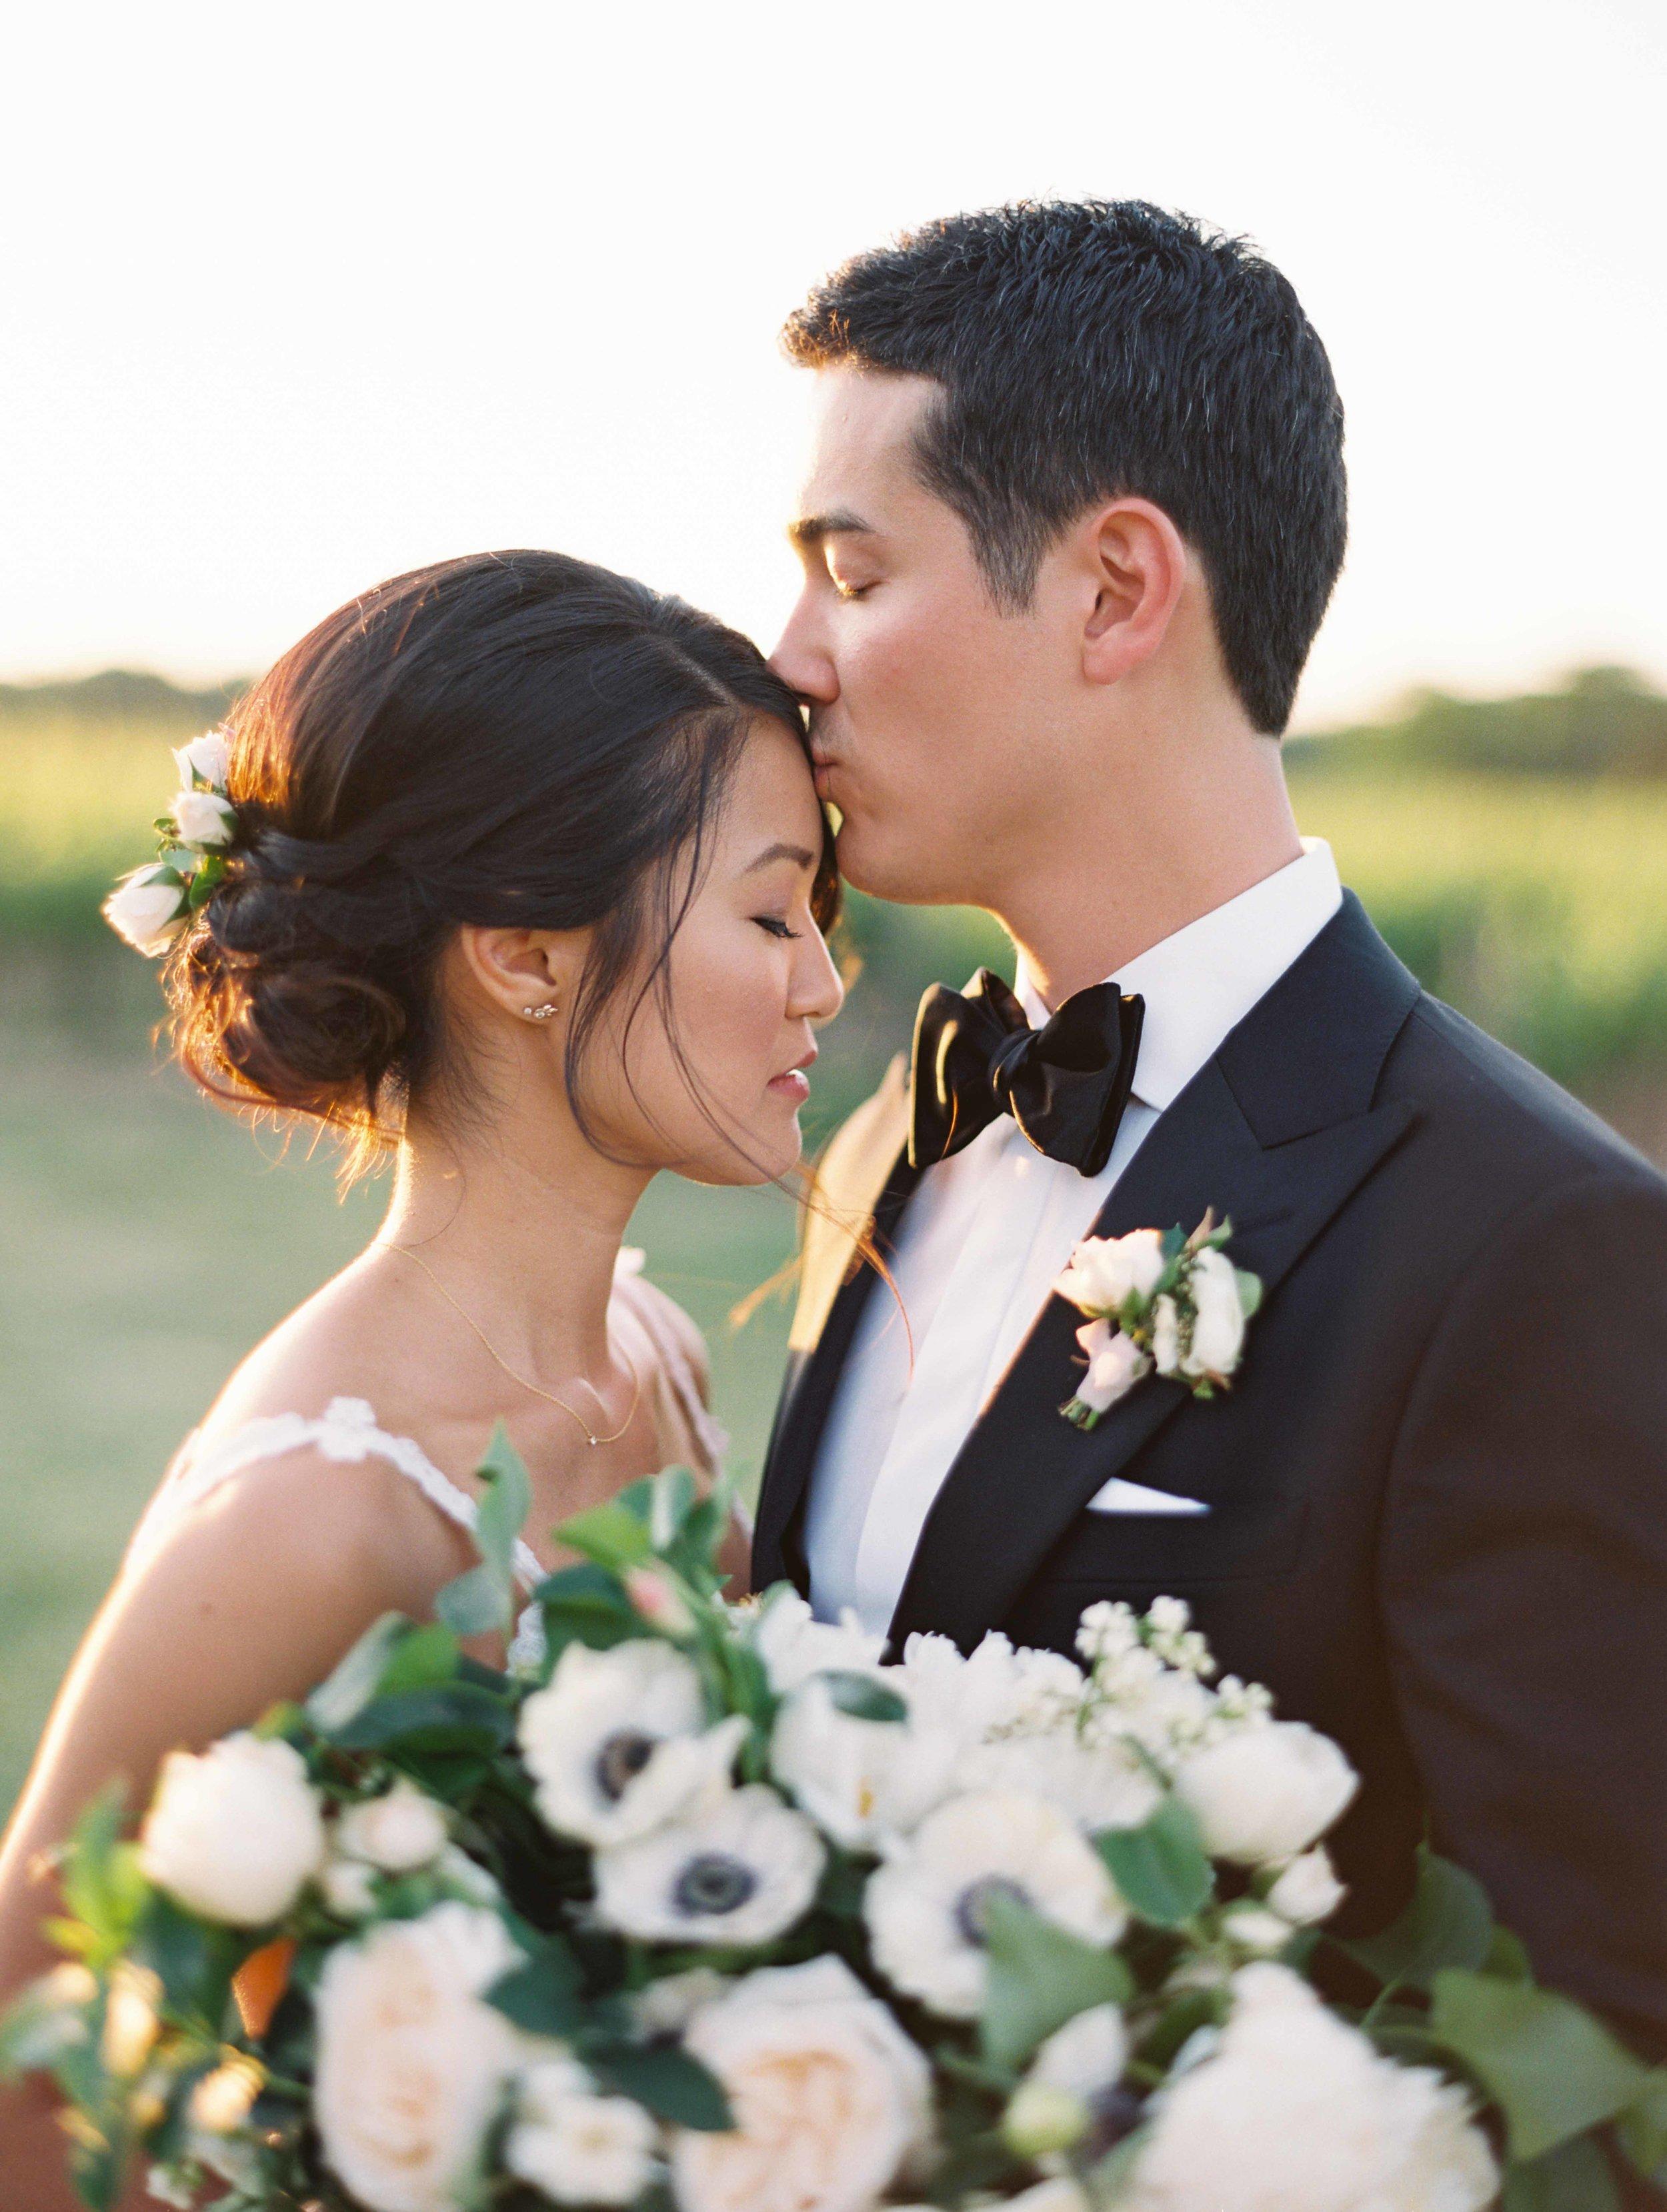 630-fine-art-film-photographer-niagara-on-the-lake-toronto-destination-wedding-brumley-wells-nick-nat.jpg